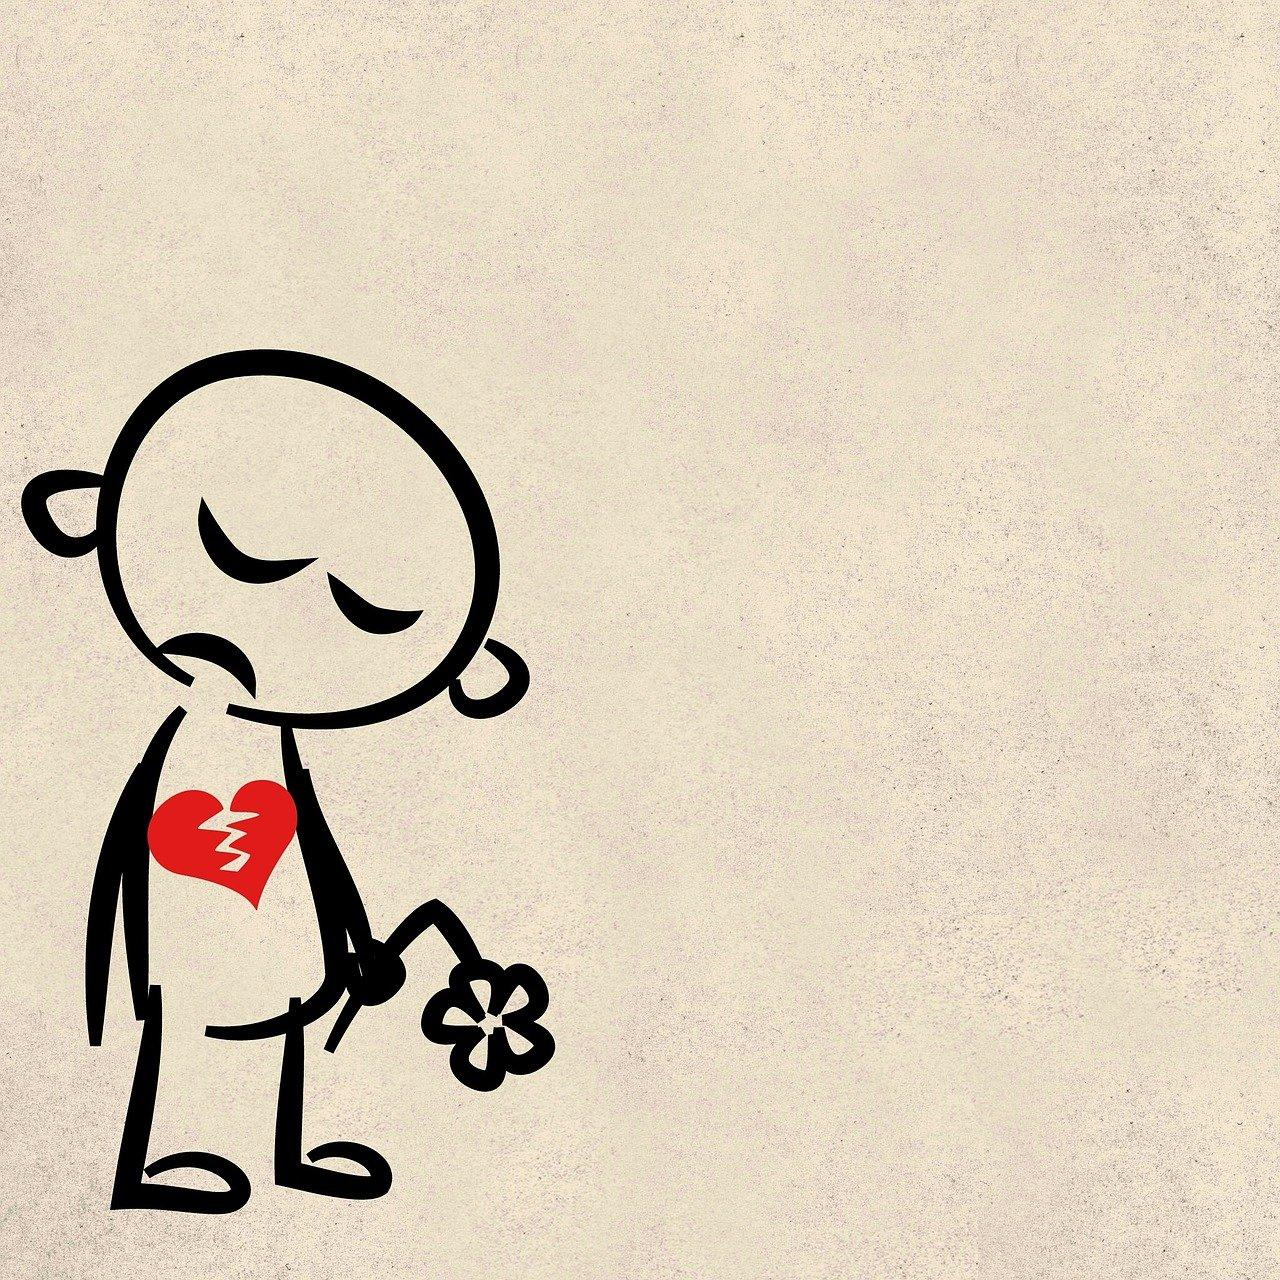 Sad Broken Heart Free Image On Pixabay